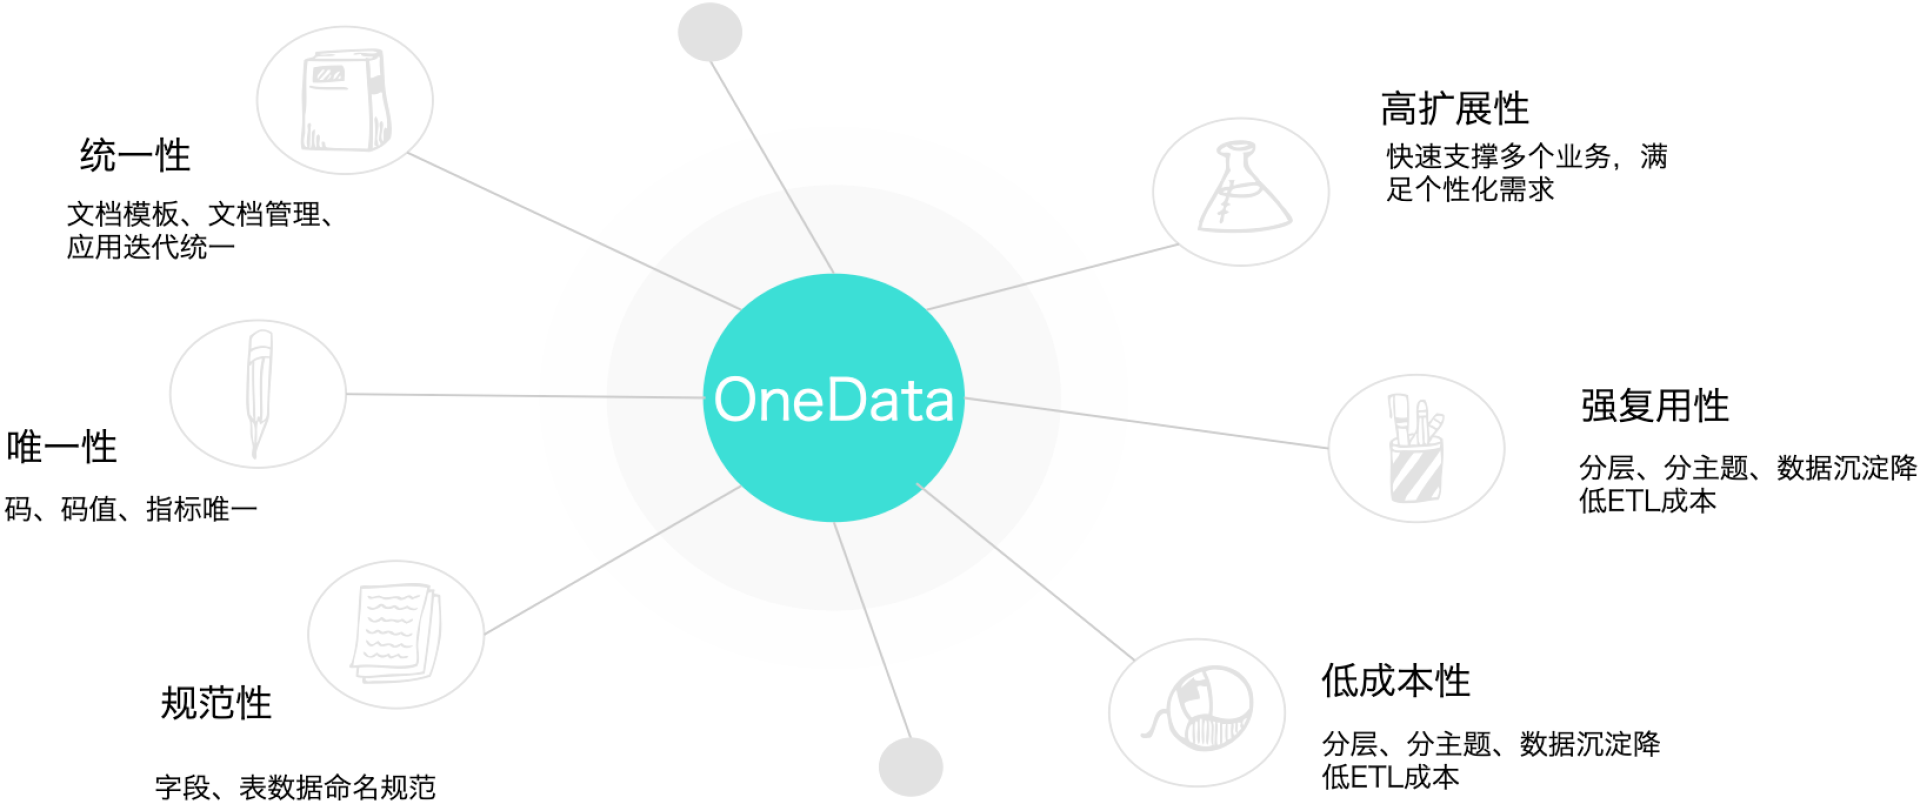 图2 OneData的六个特性